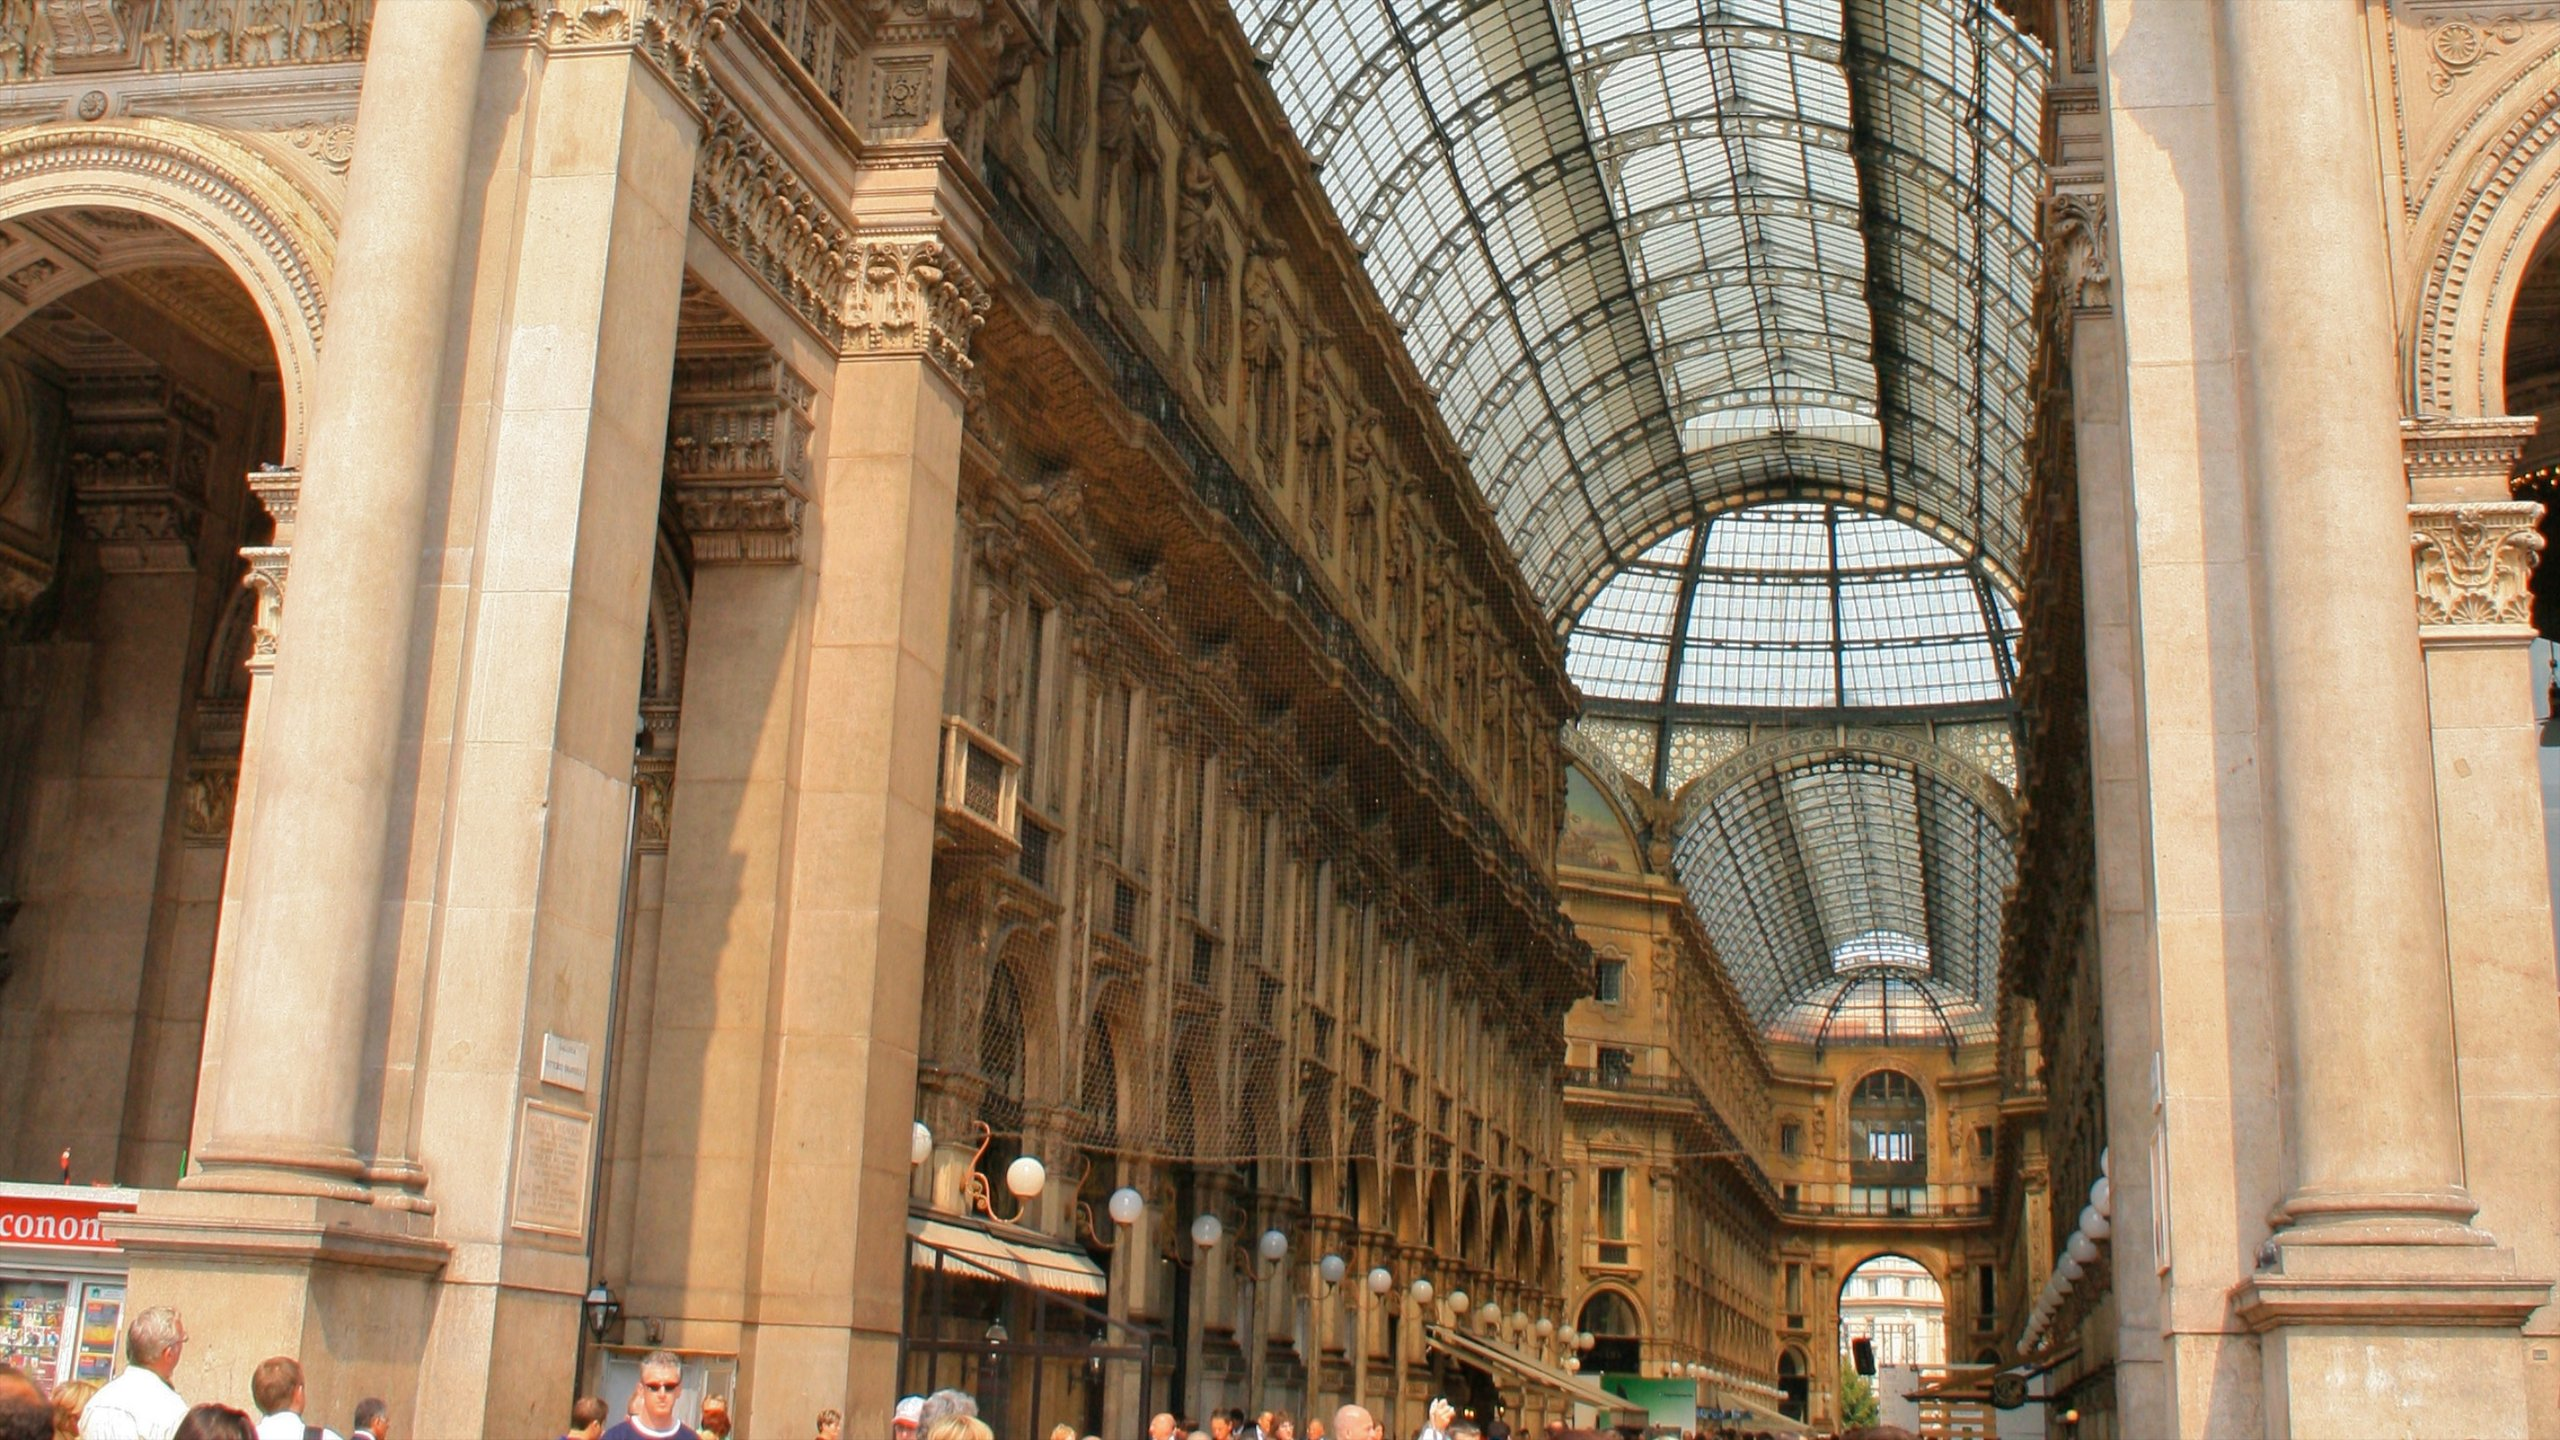 Metropolitan City of Milan, Lombardy, Italy